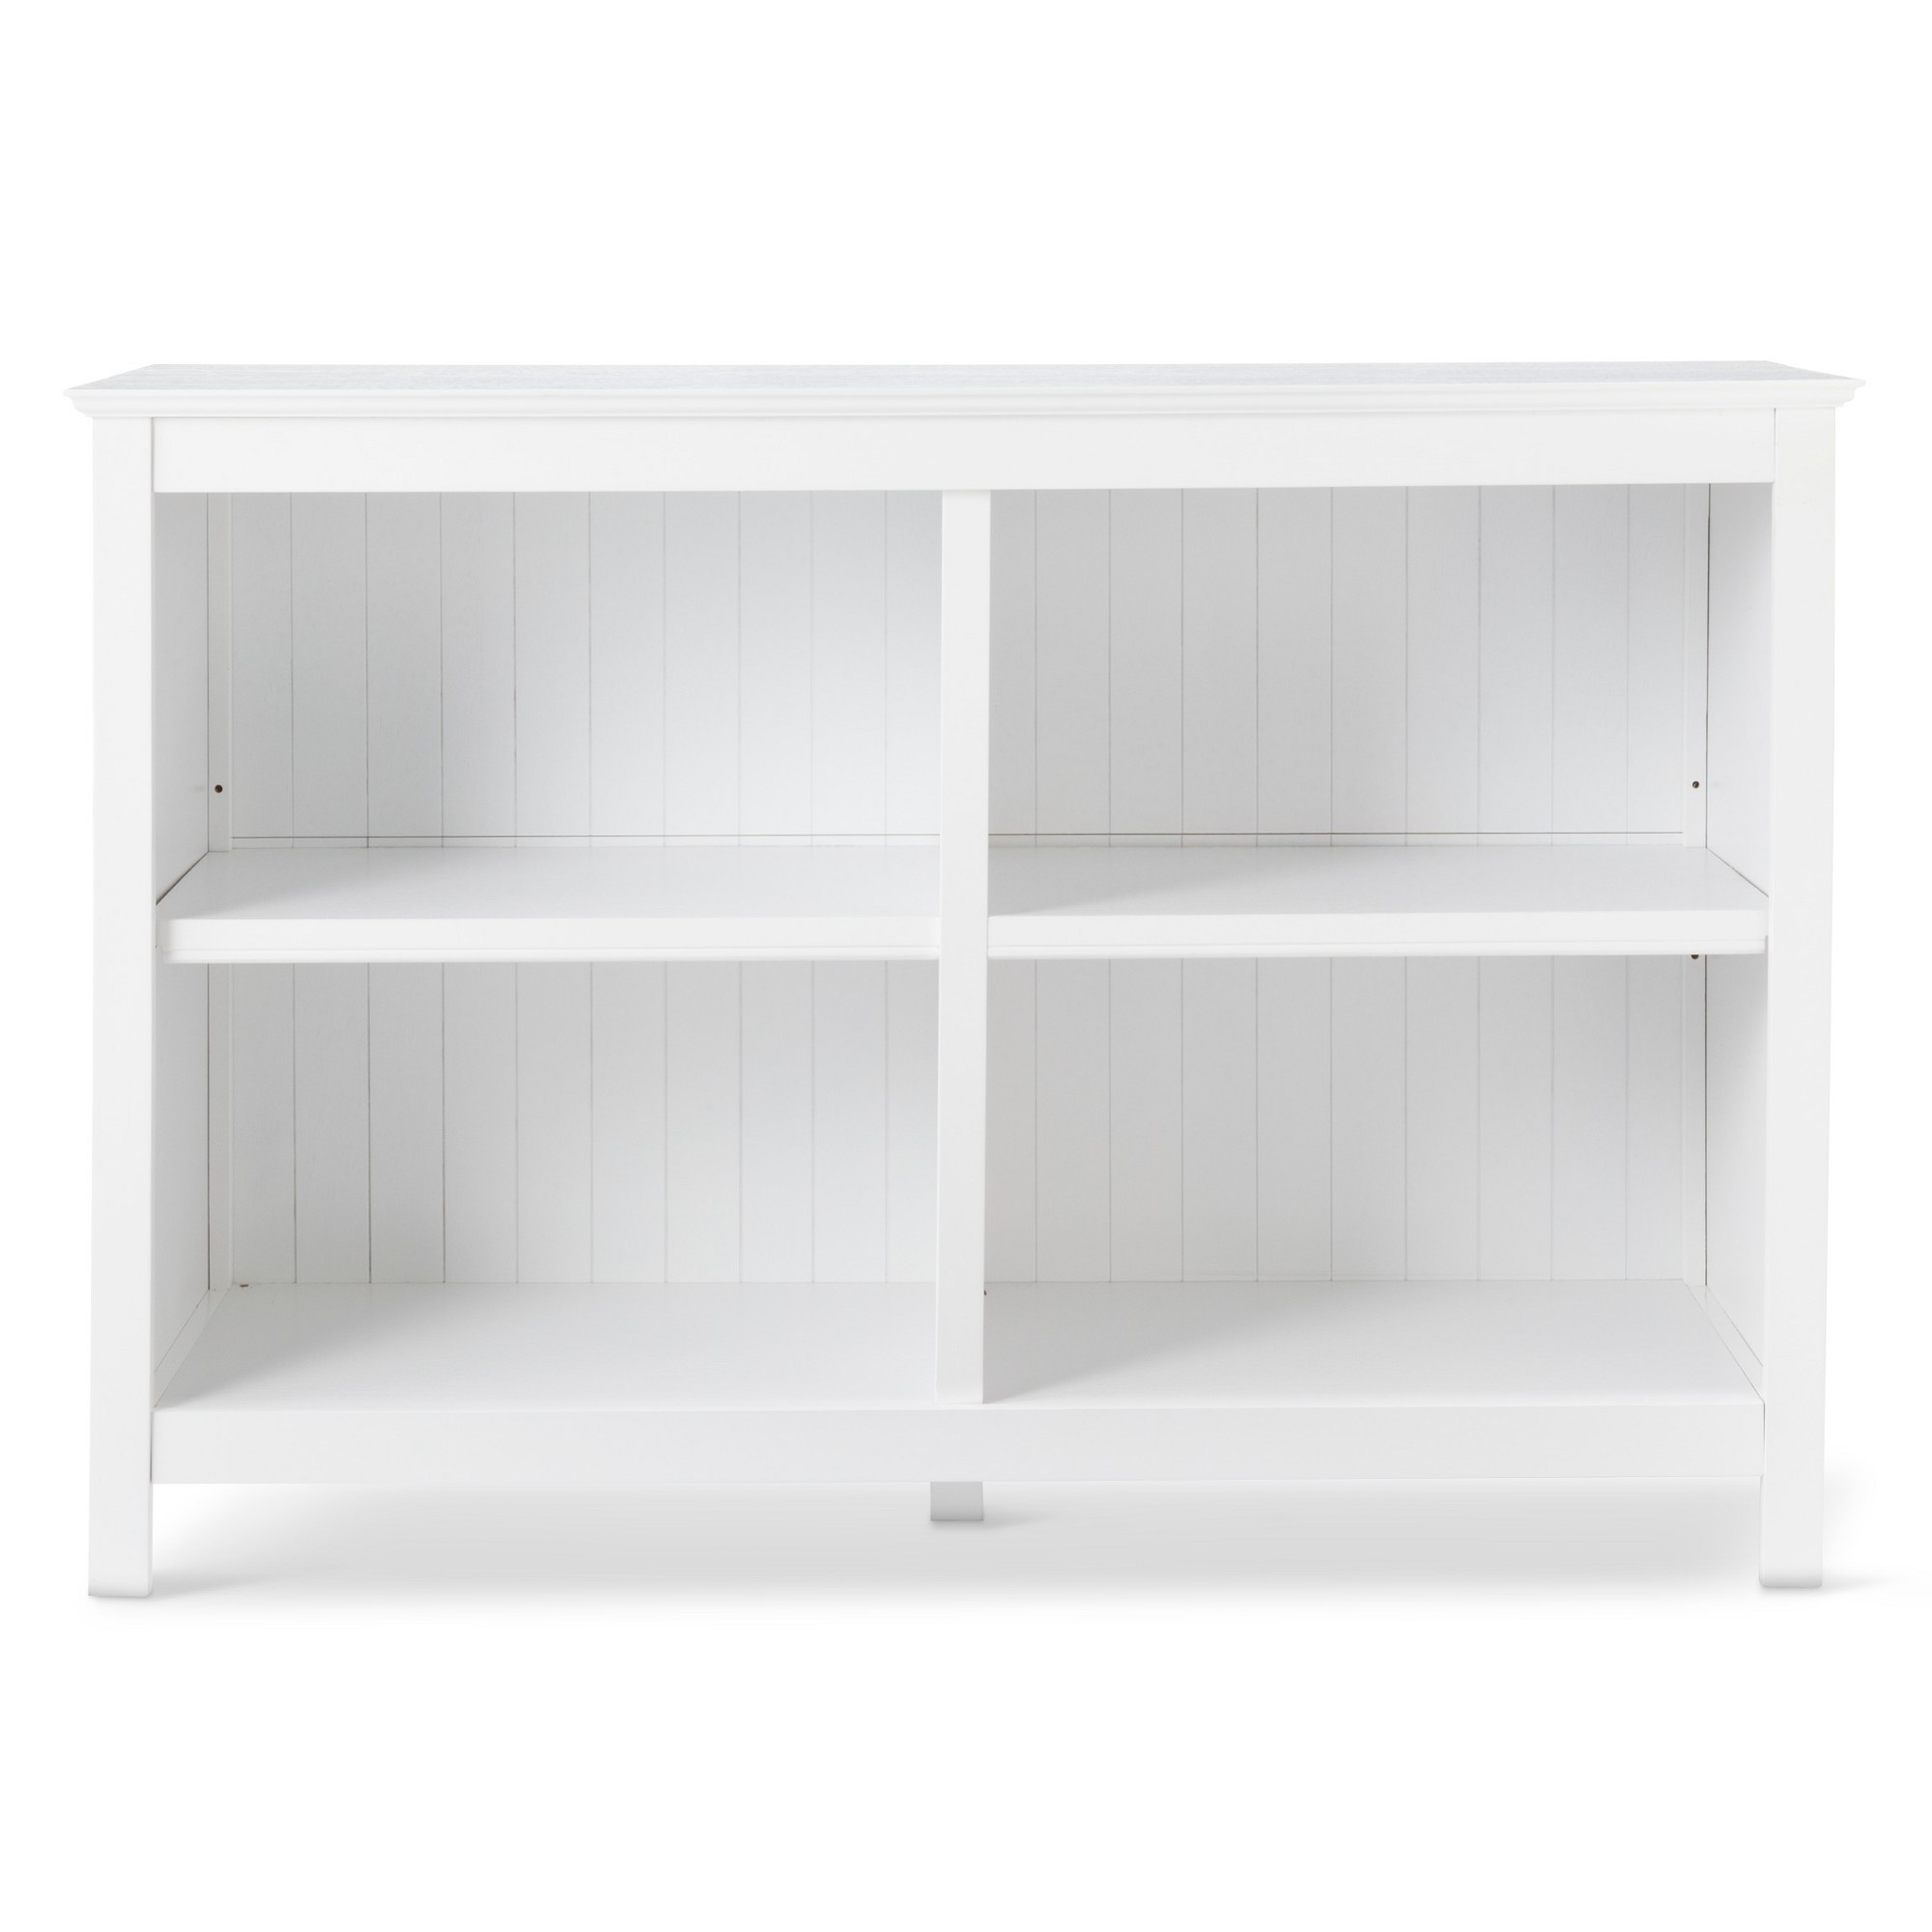 mobilemonitors bookshelves bookcase totem shelves bookcases for table fabulous modern book horizontal cute white nursery